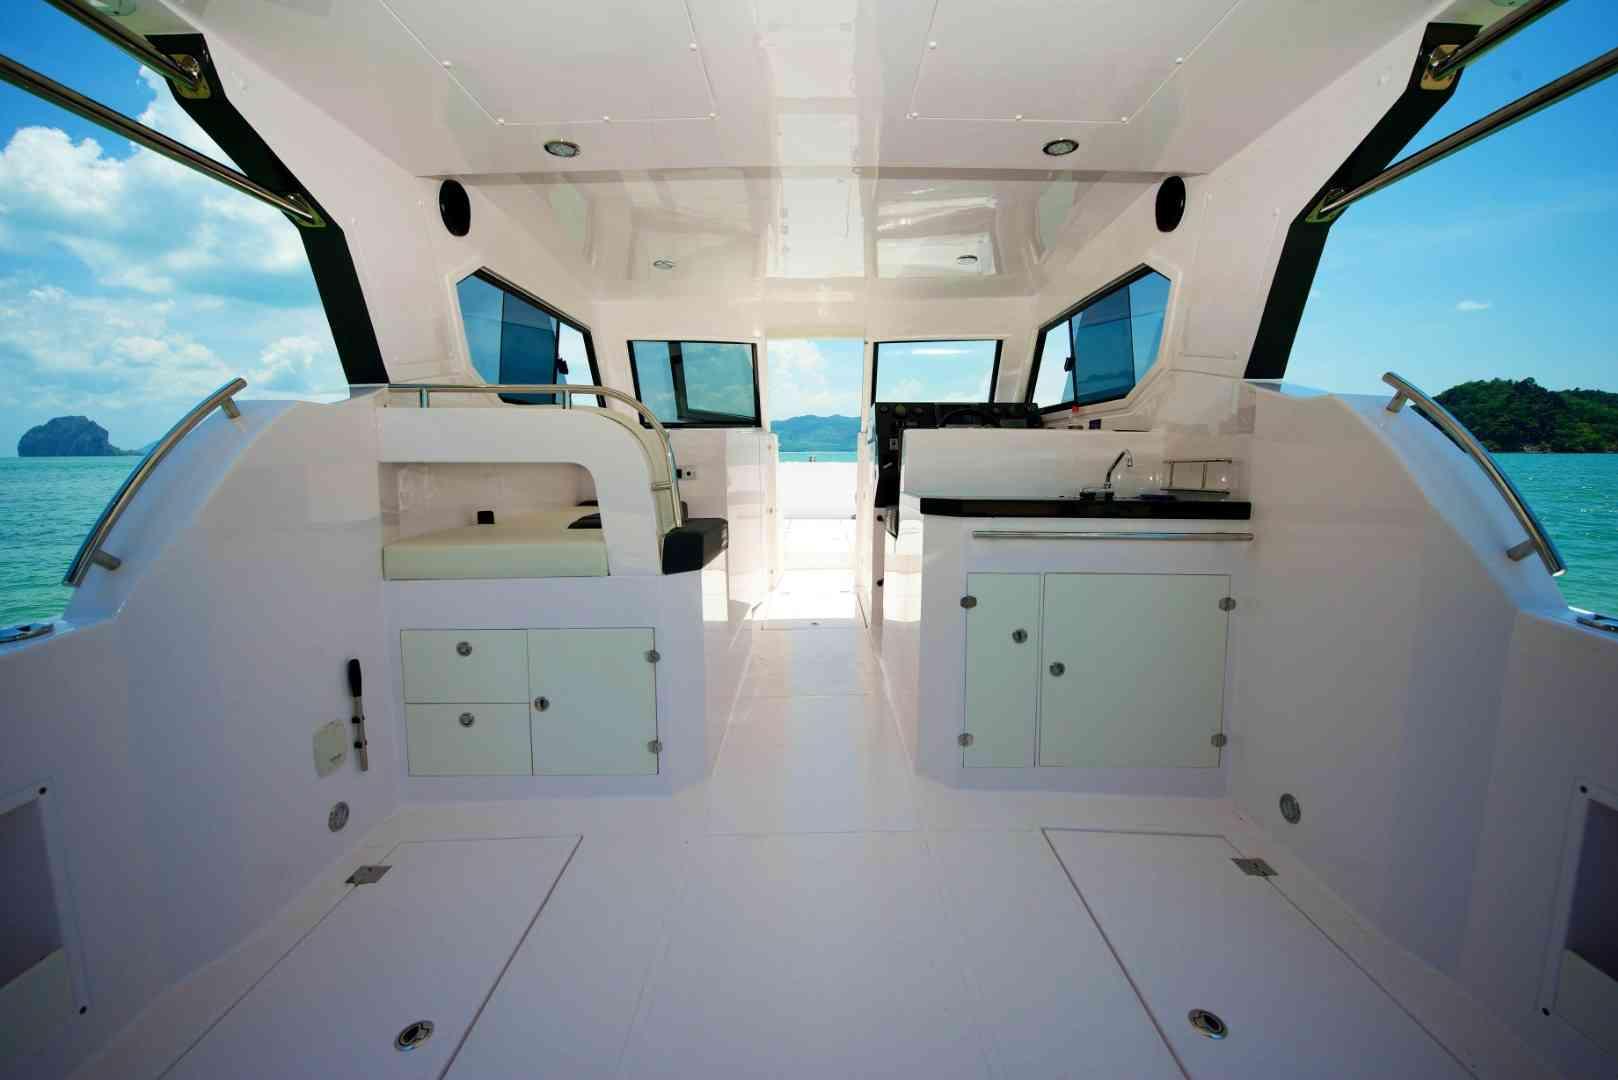 [a]https%3A%2F%2Fwww.yachtrentaldubai.ae%2F[/a] توب تشارترز لتأجير اليخوت-  قارب ماركة سيلفر كرافت 36...